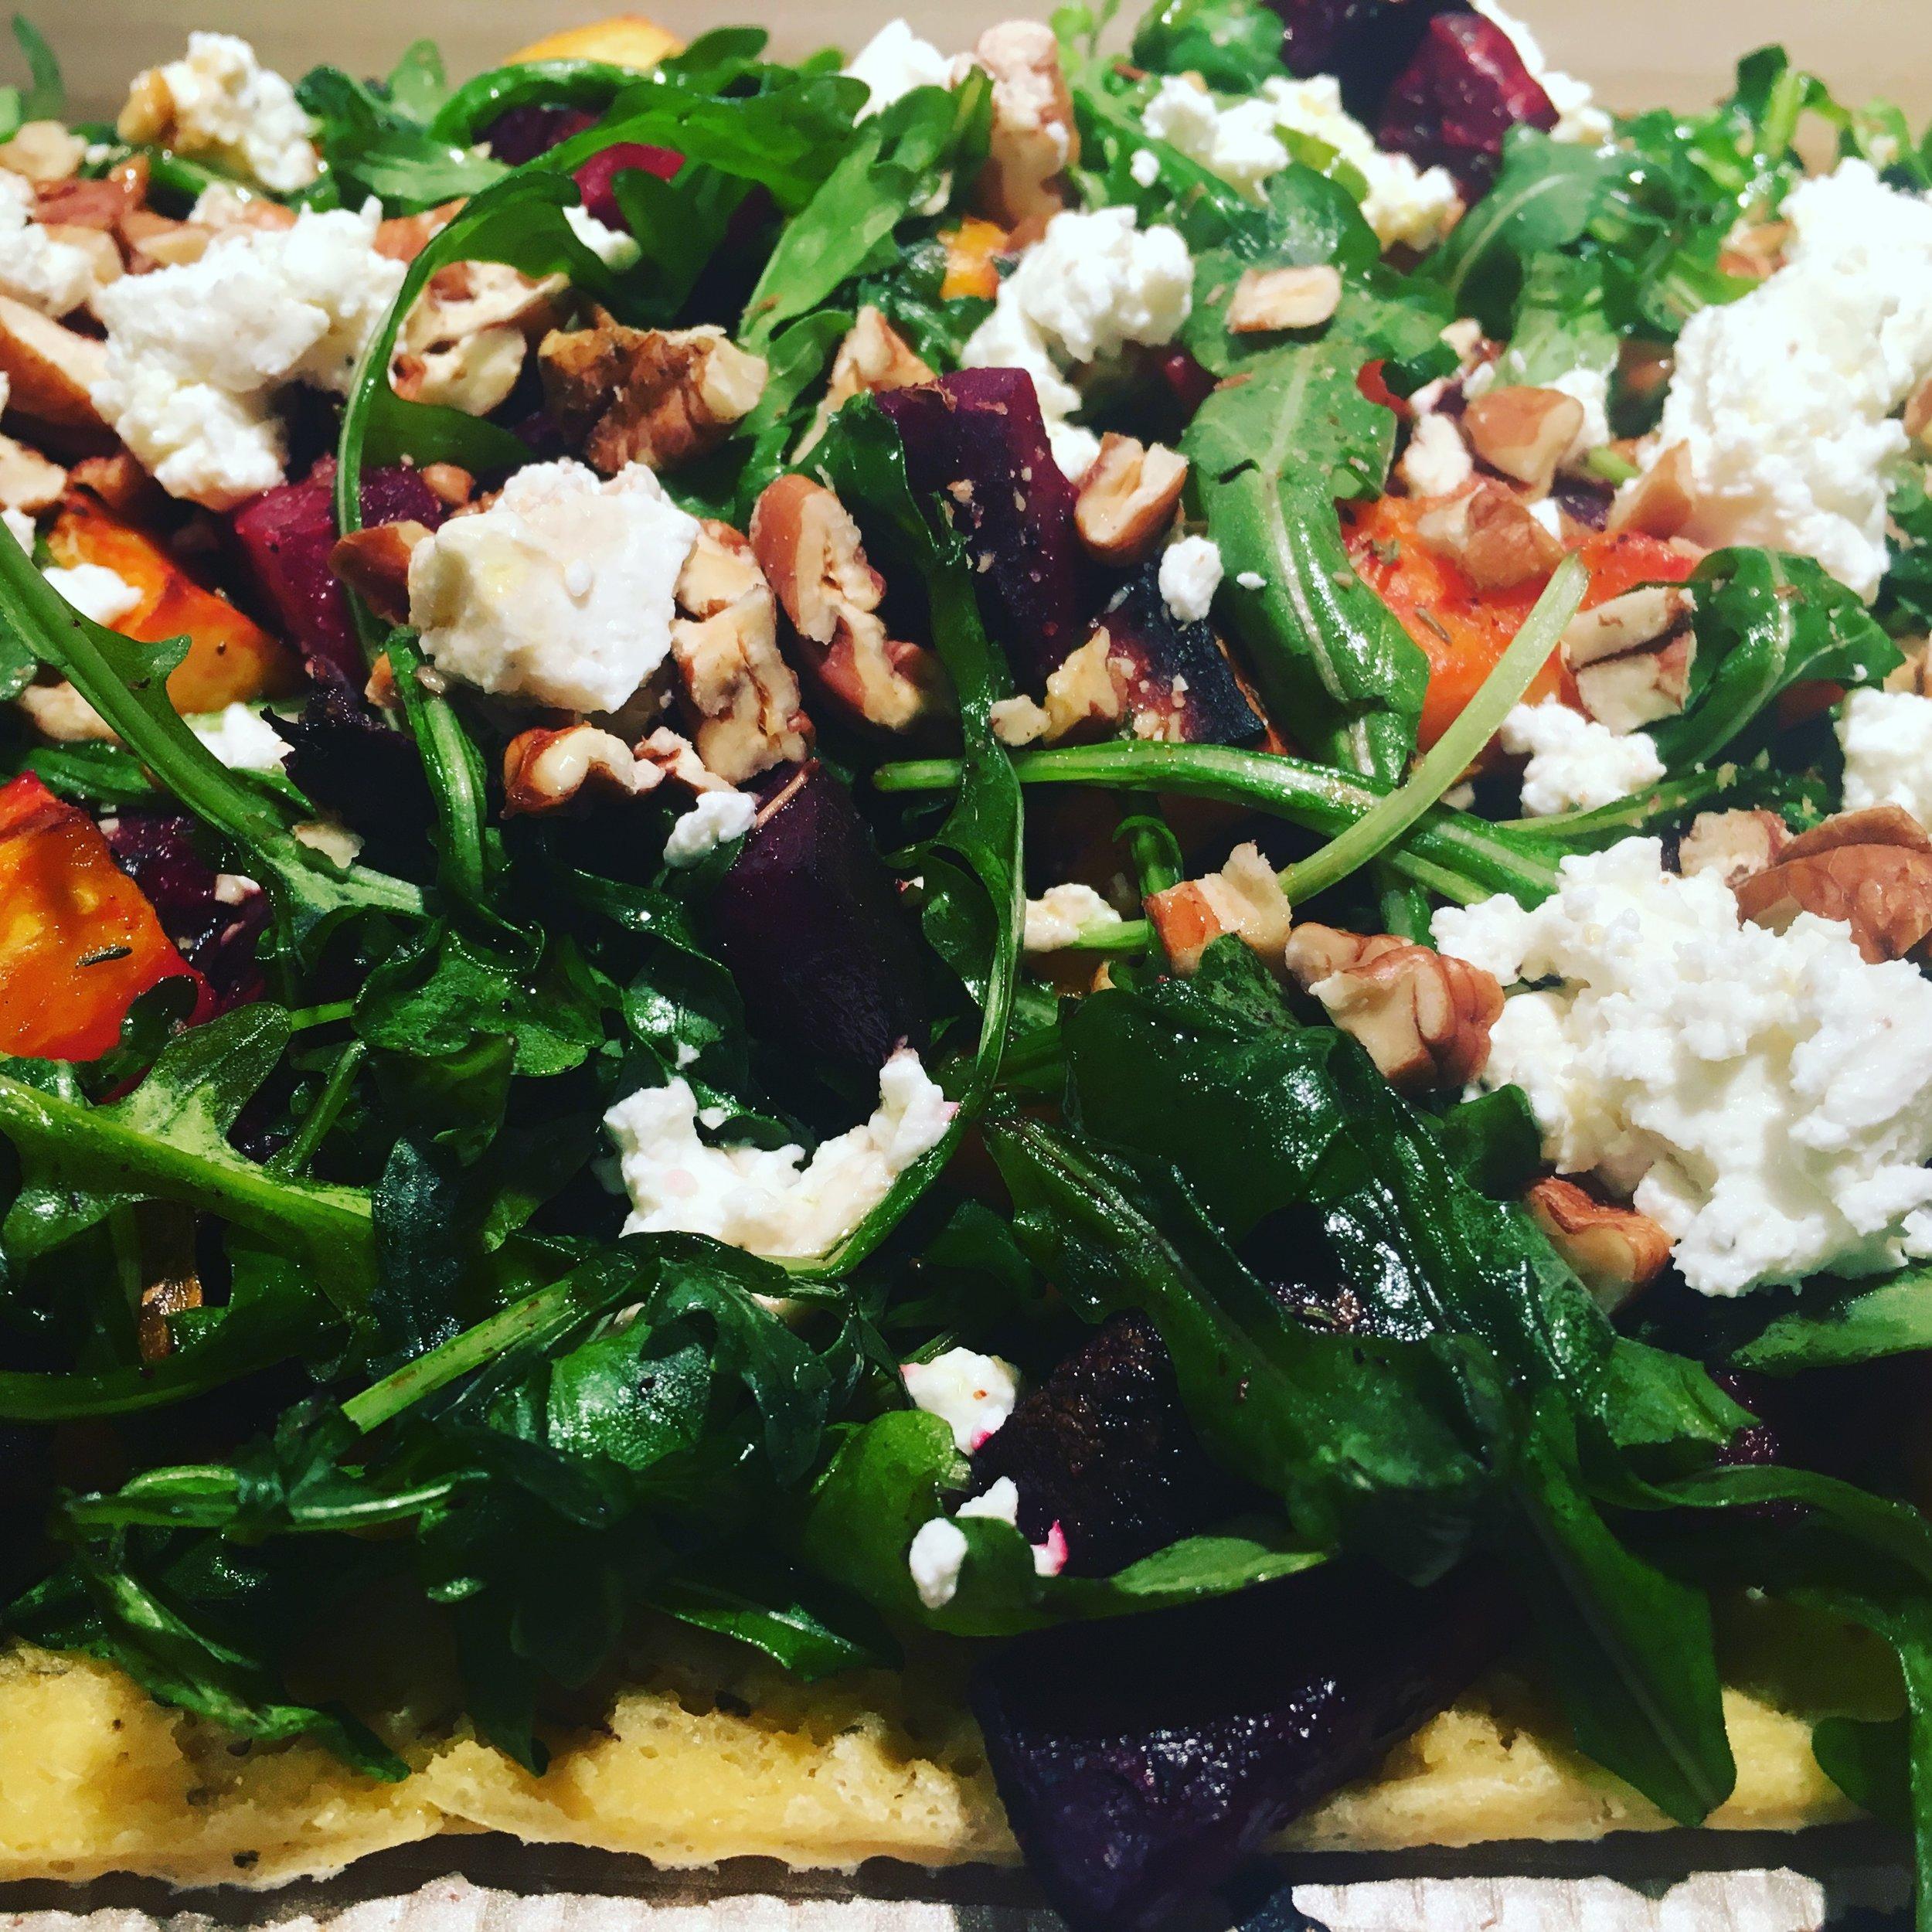 Pizza Night! Winter Vegetable Flatbreads w Salad.JPG